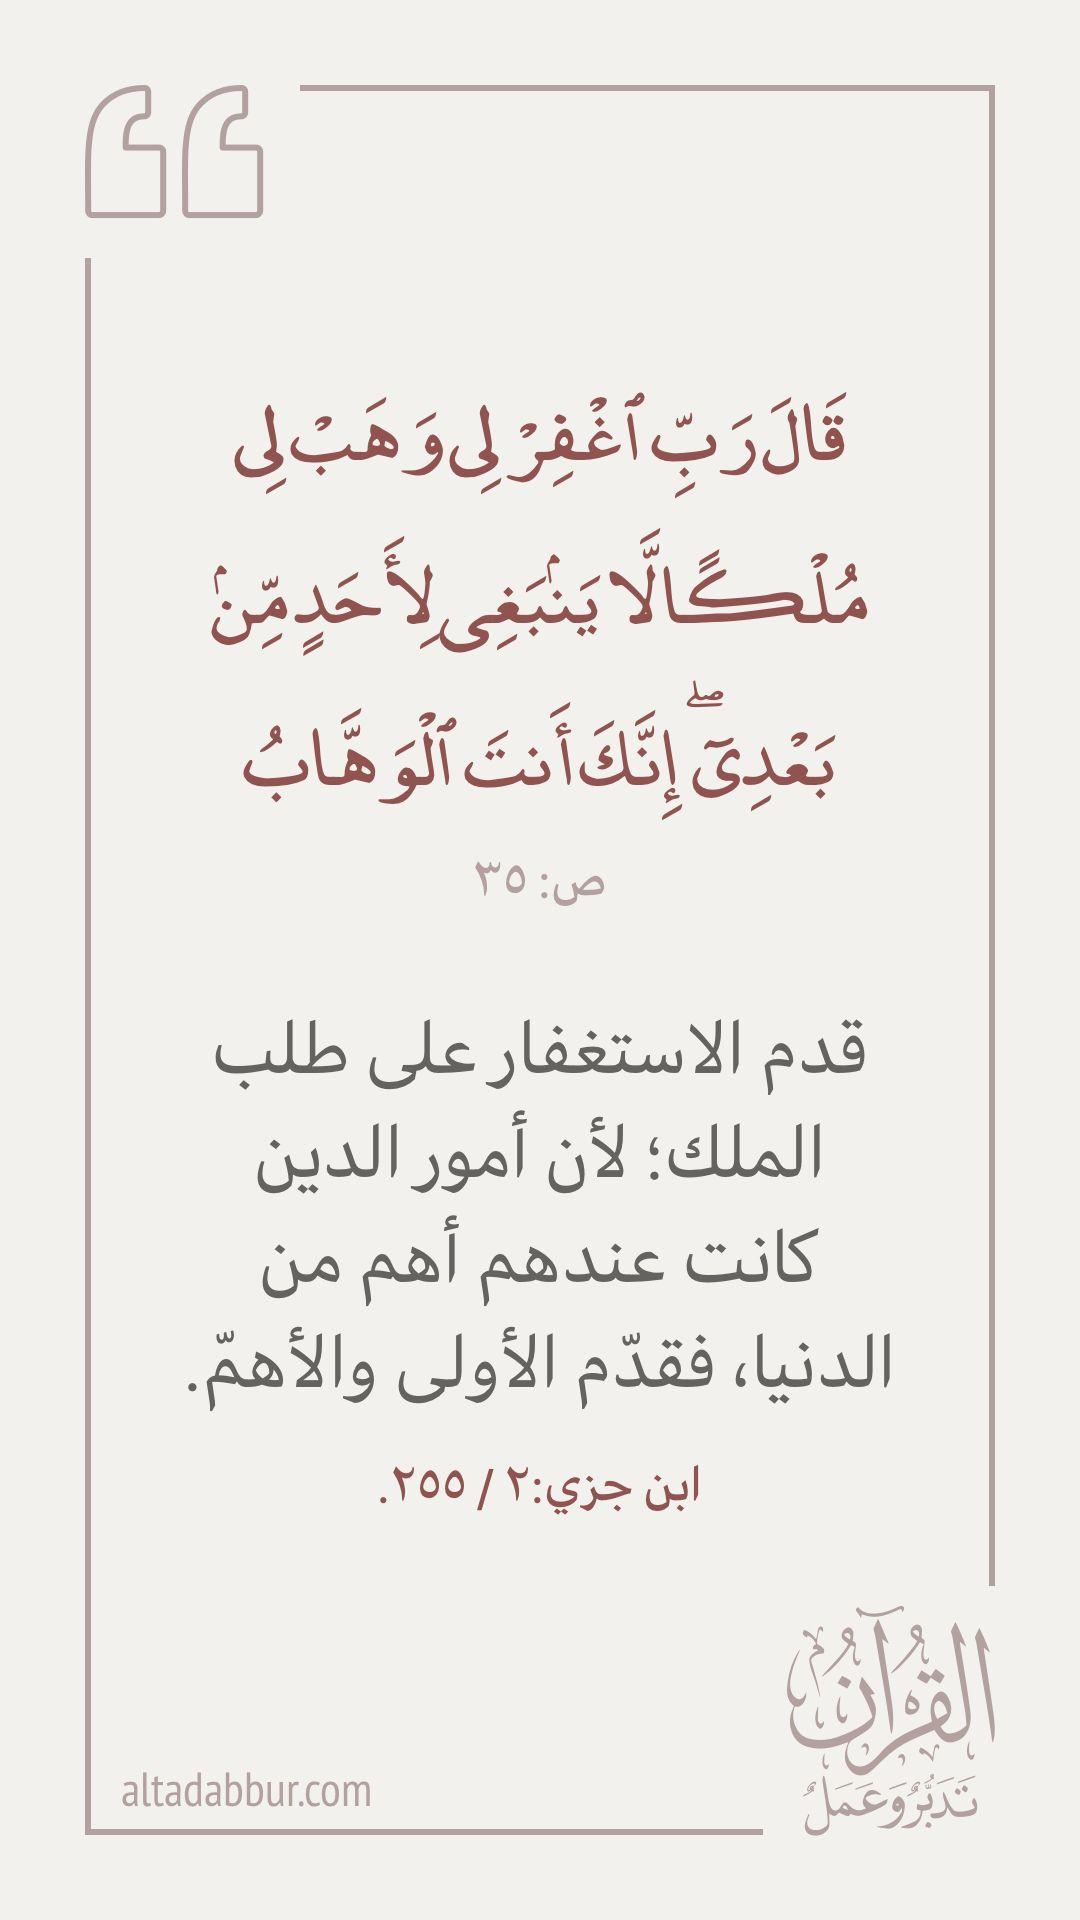 Pin By On قرآن تفسير وتدب ر Islamic Quotes Quran Quran Verses Beautiful Arabic Words